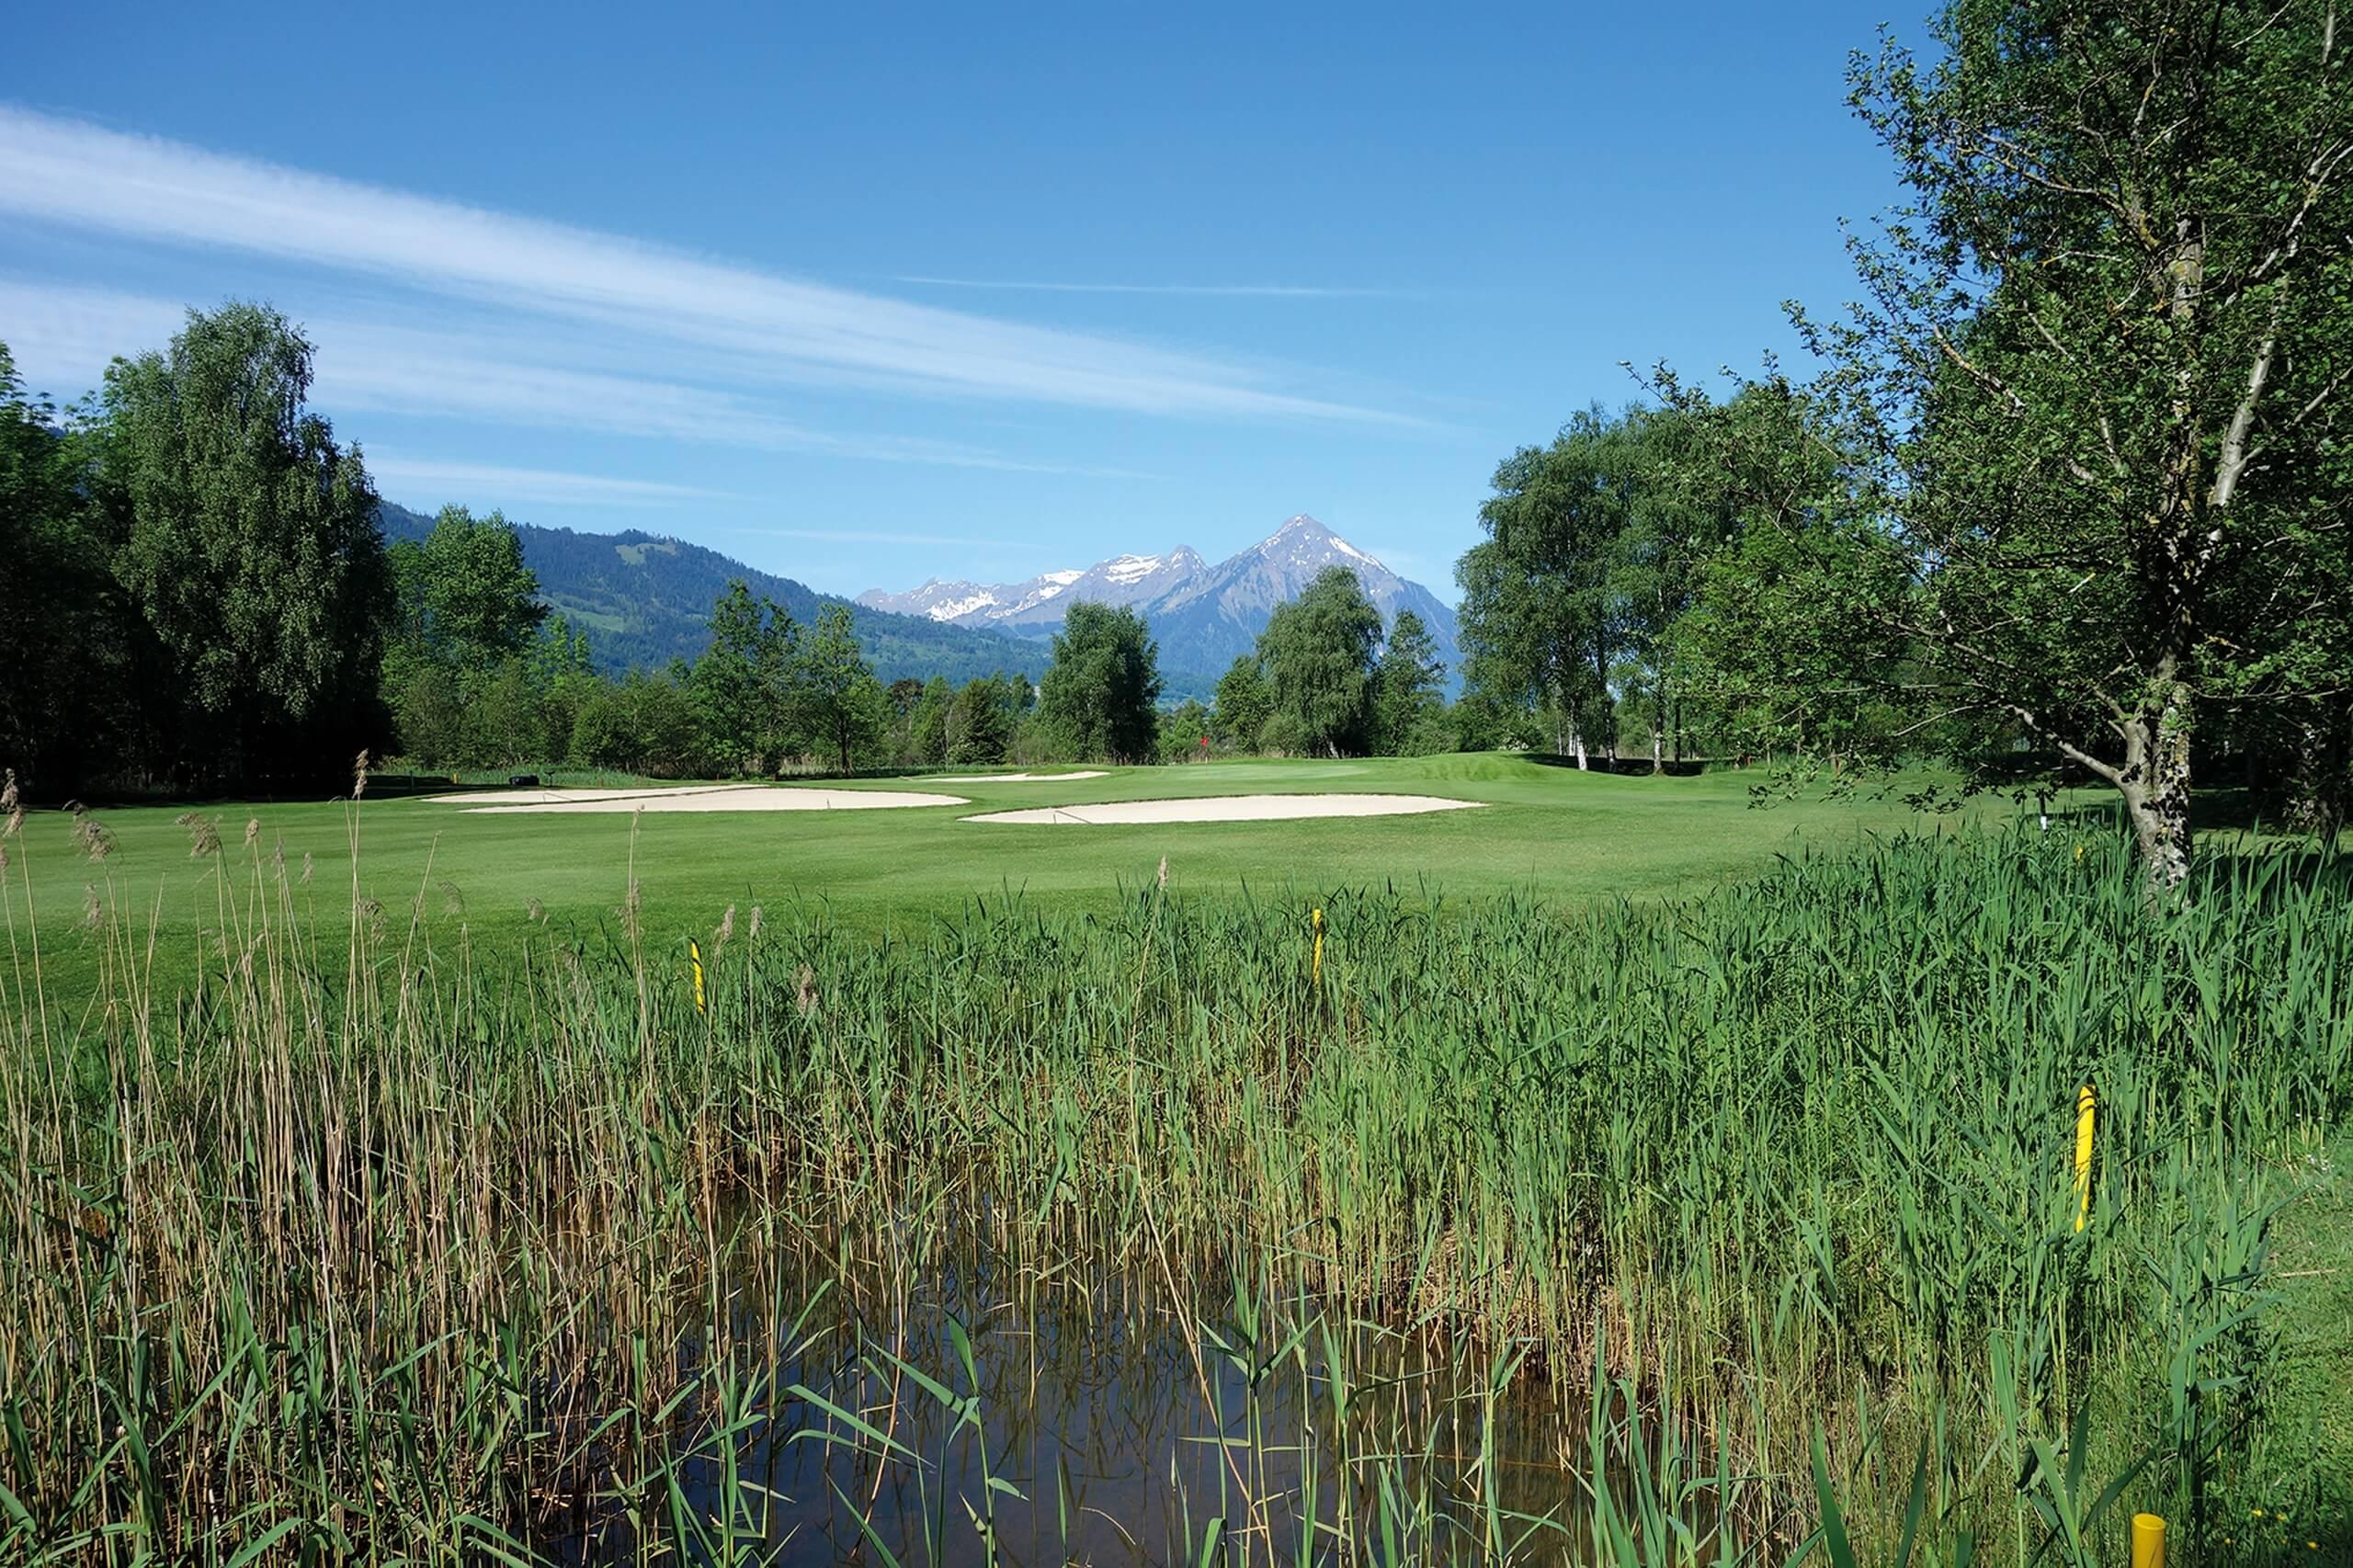 unterseen-golfplatz-gruene-wiese-sommer-golf-spielen